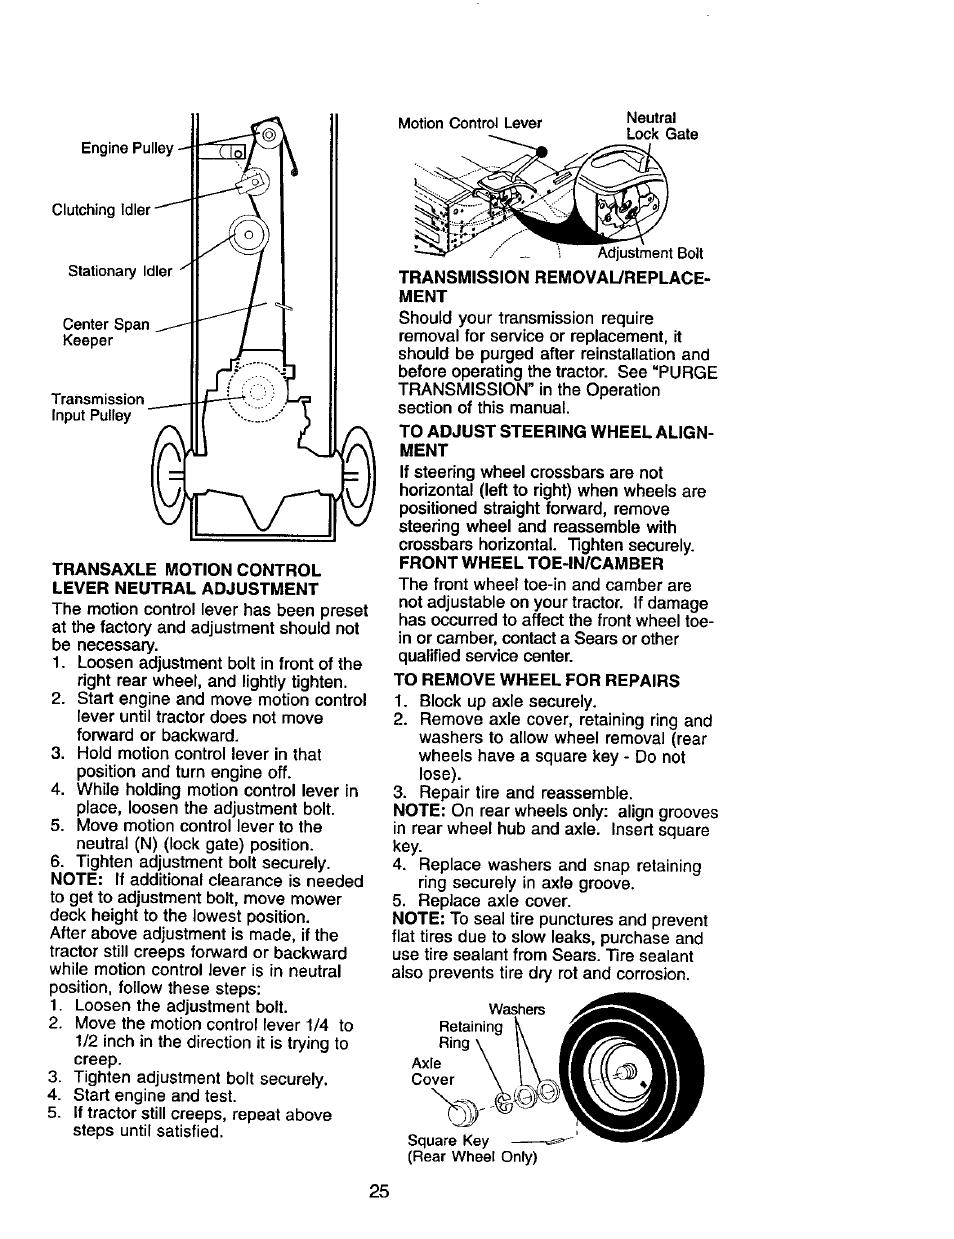 Transaxle motion control lever neutral adjustment